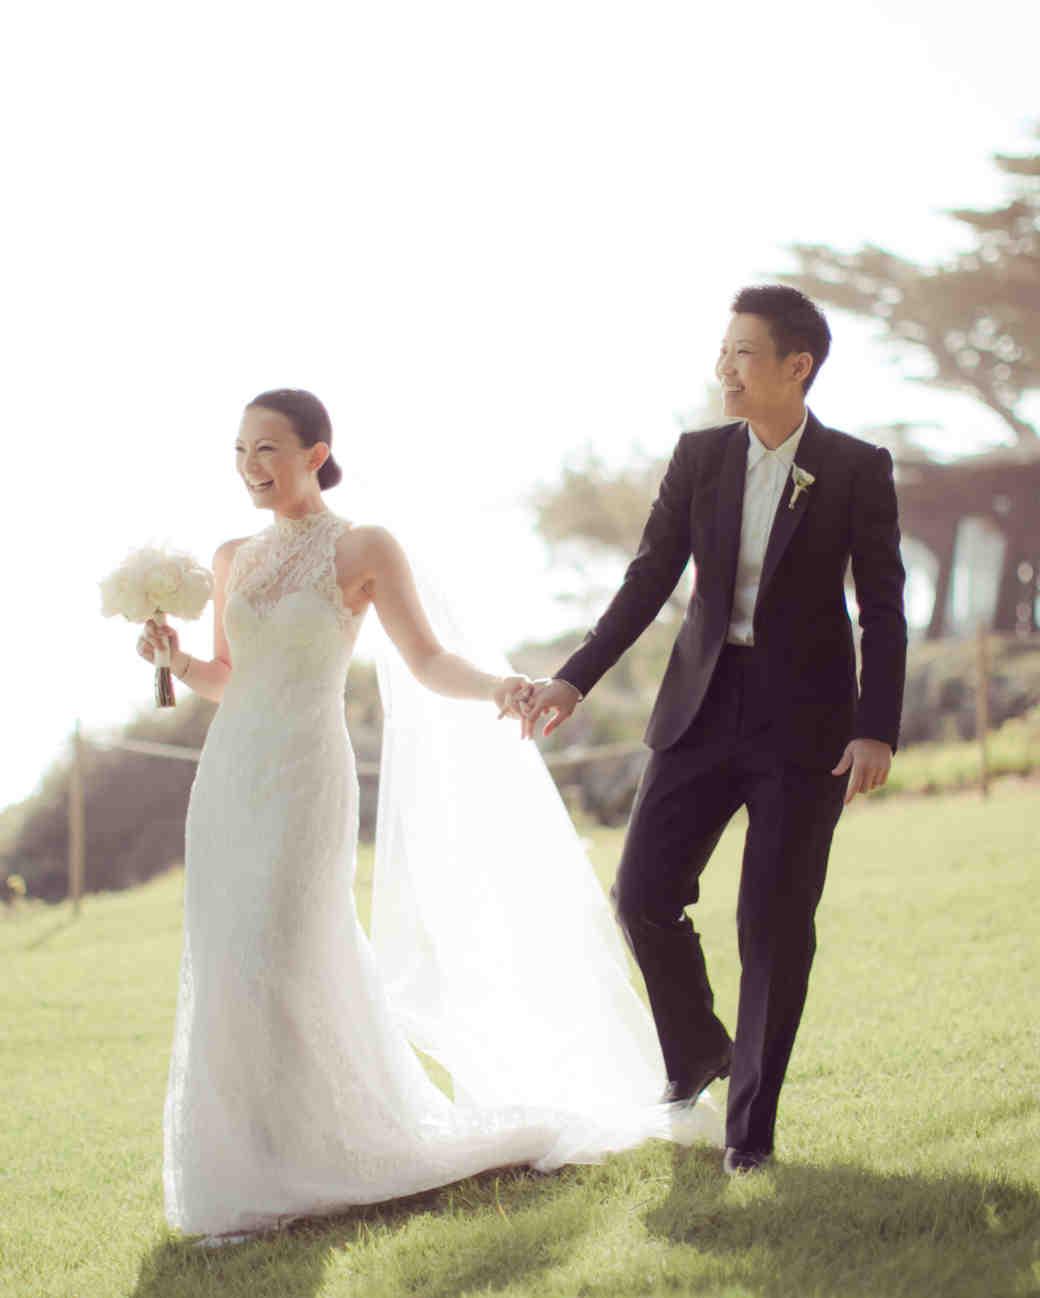 emma-michelle-wedding-couple-0716-s112079-0715.jpg